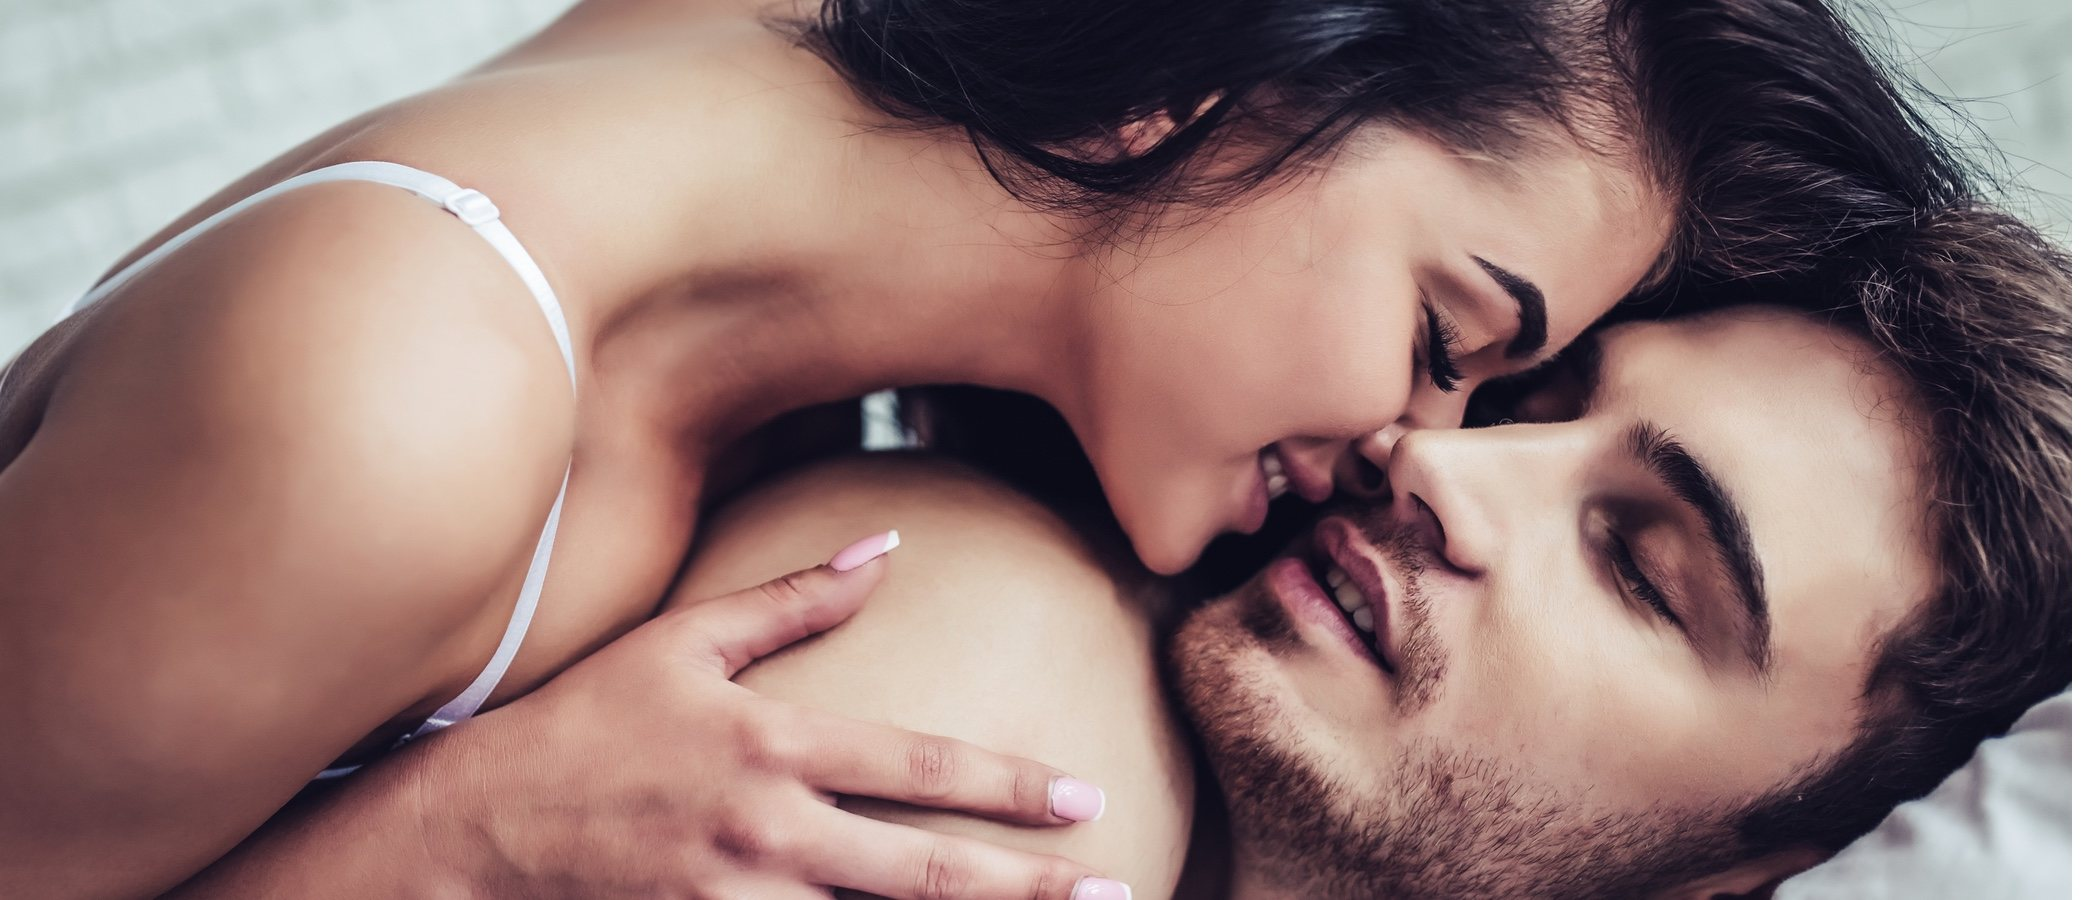 Horóscopo sexual febrero 2020: Libra